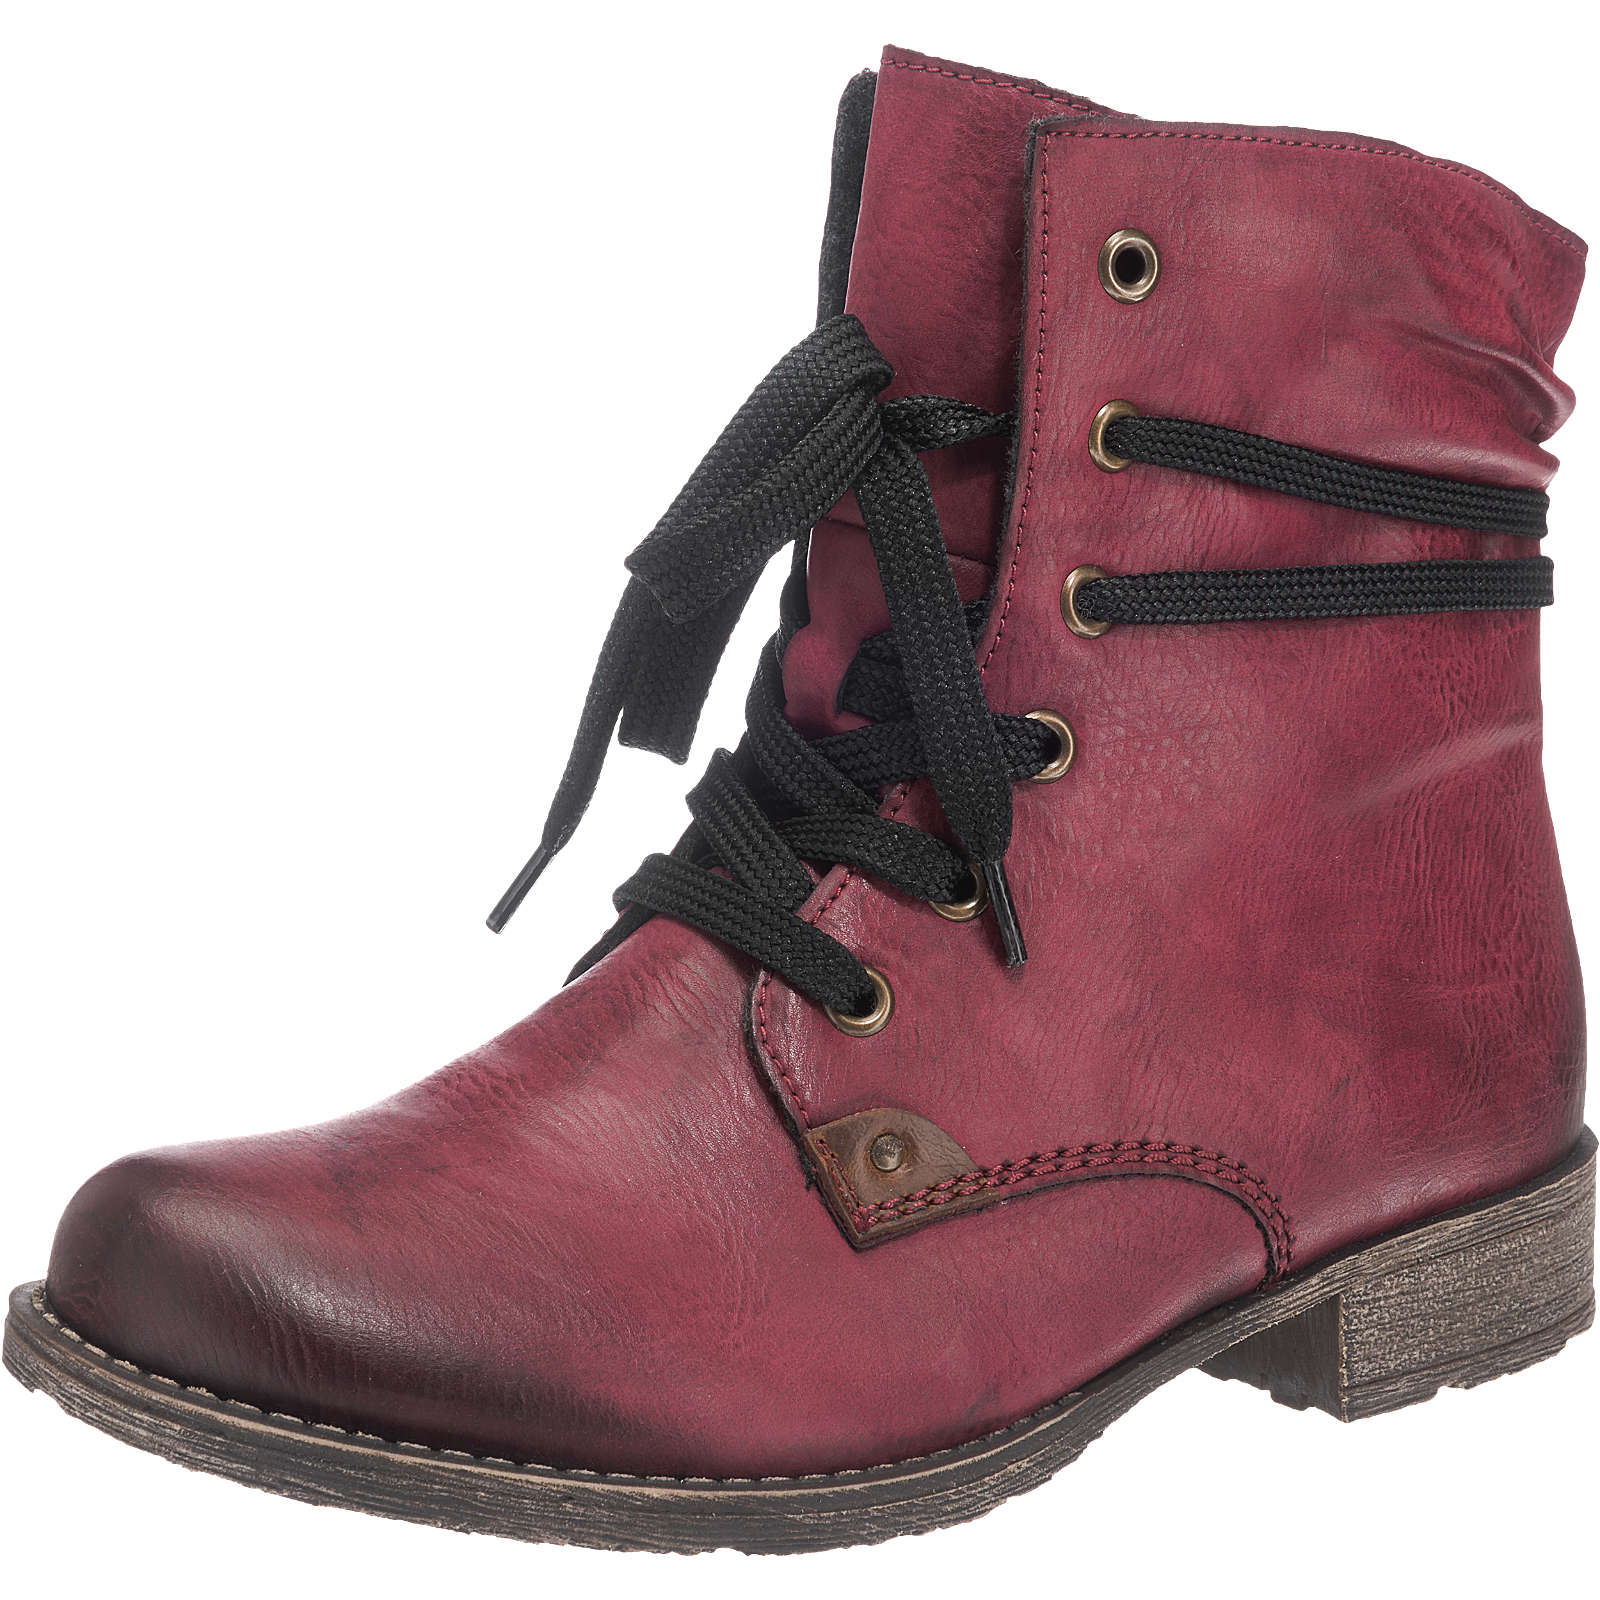 billig rieker schn rstiefeletten rot damen gr 39 outlet stiefel boots stiefeletten. Black Bedroom Furniture Sets. Home Design Ideas